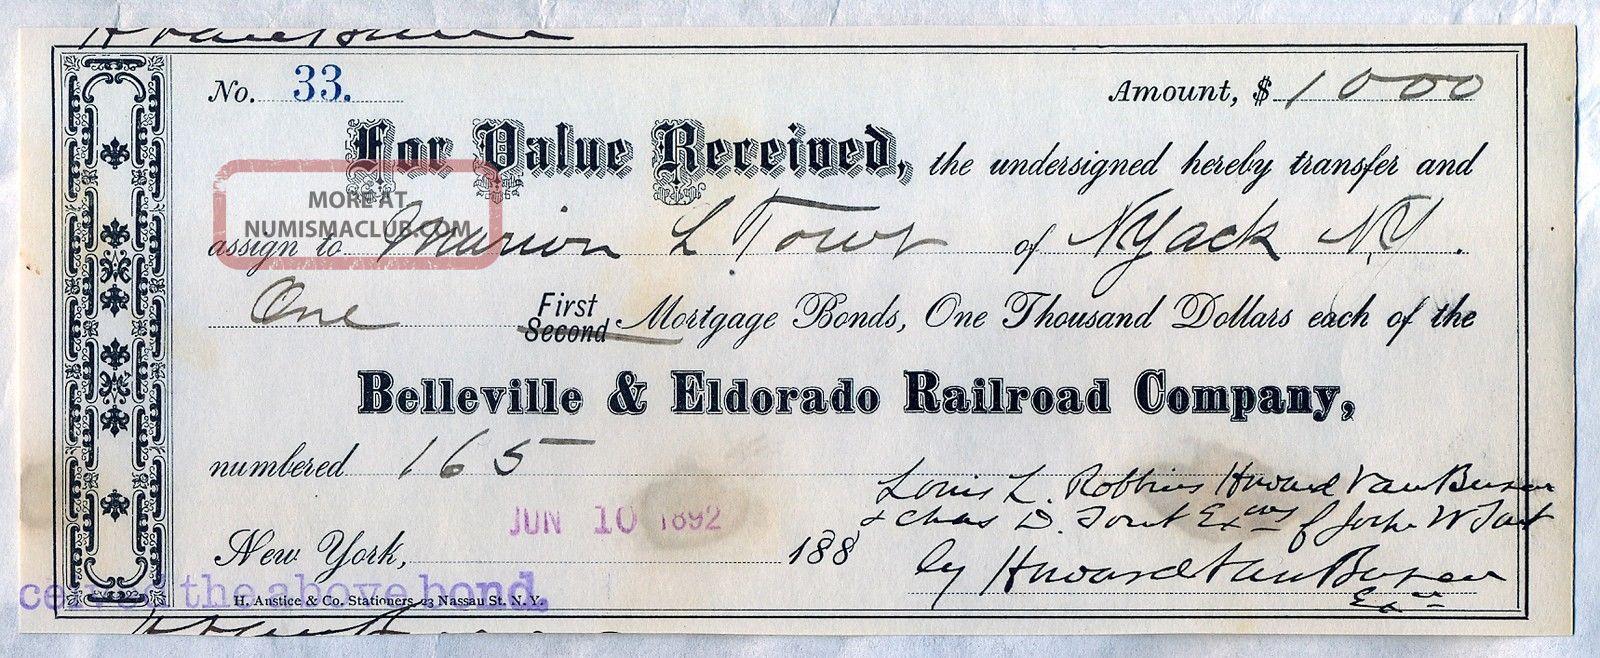 Belleville & Eldorado Railroad Company Transfer Slip Stock Bond Certificate Ny Transportation photo